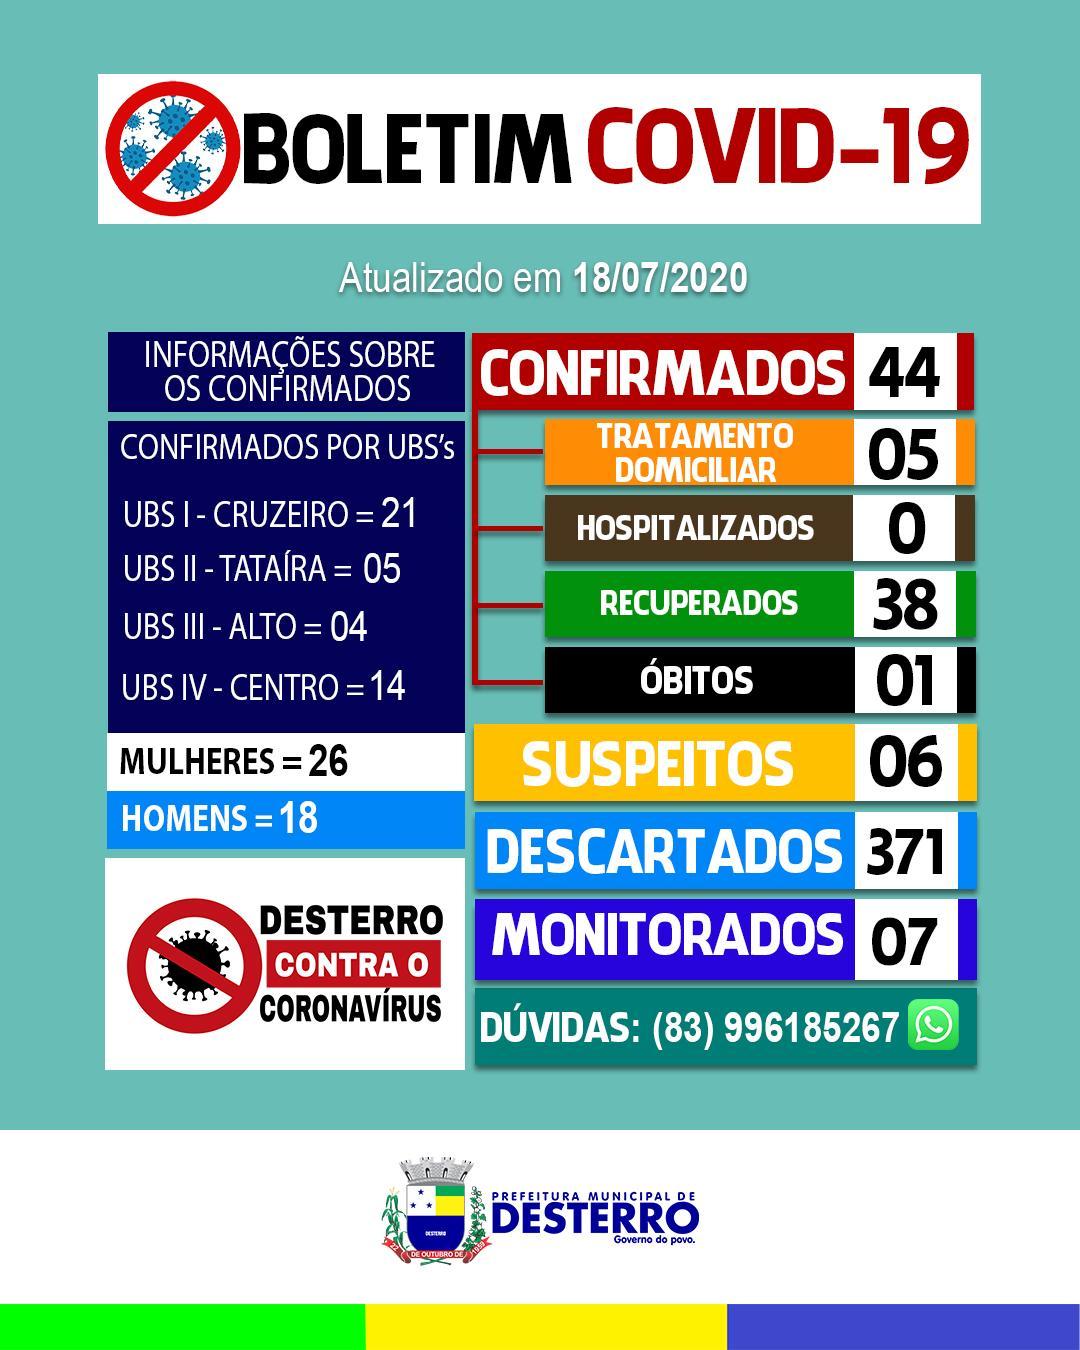 Boletim Covid-19 (18/07/2020)